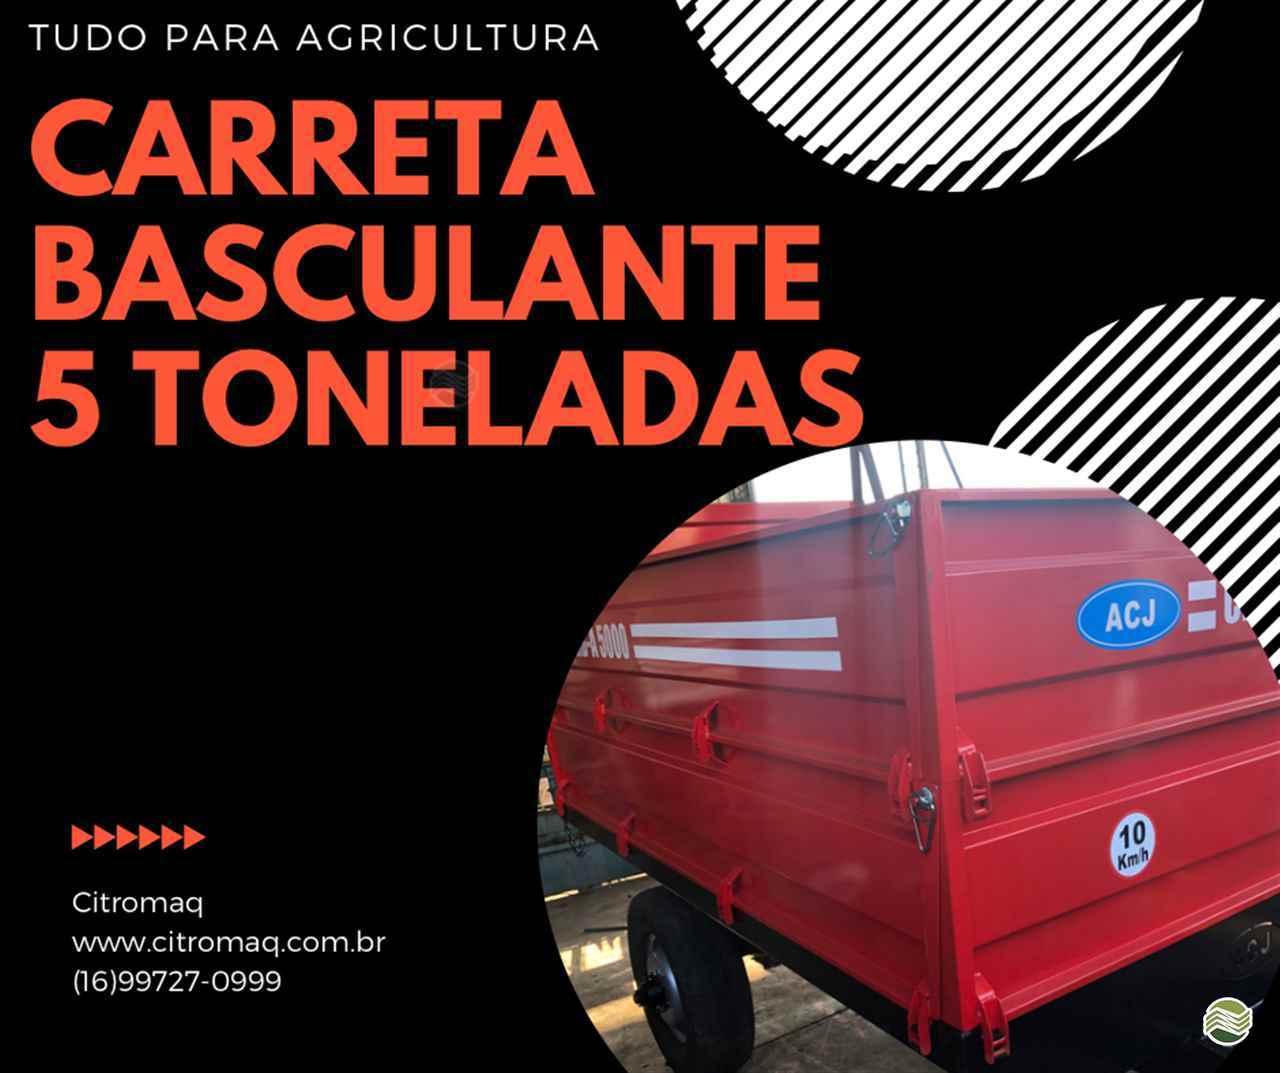 CARRETA AGRÍCOLA CARRETA BASCULANTE  2020 Citromaq